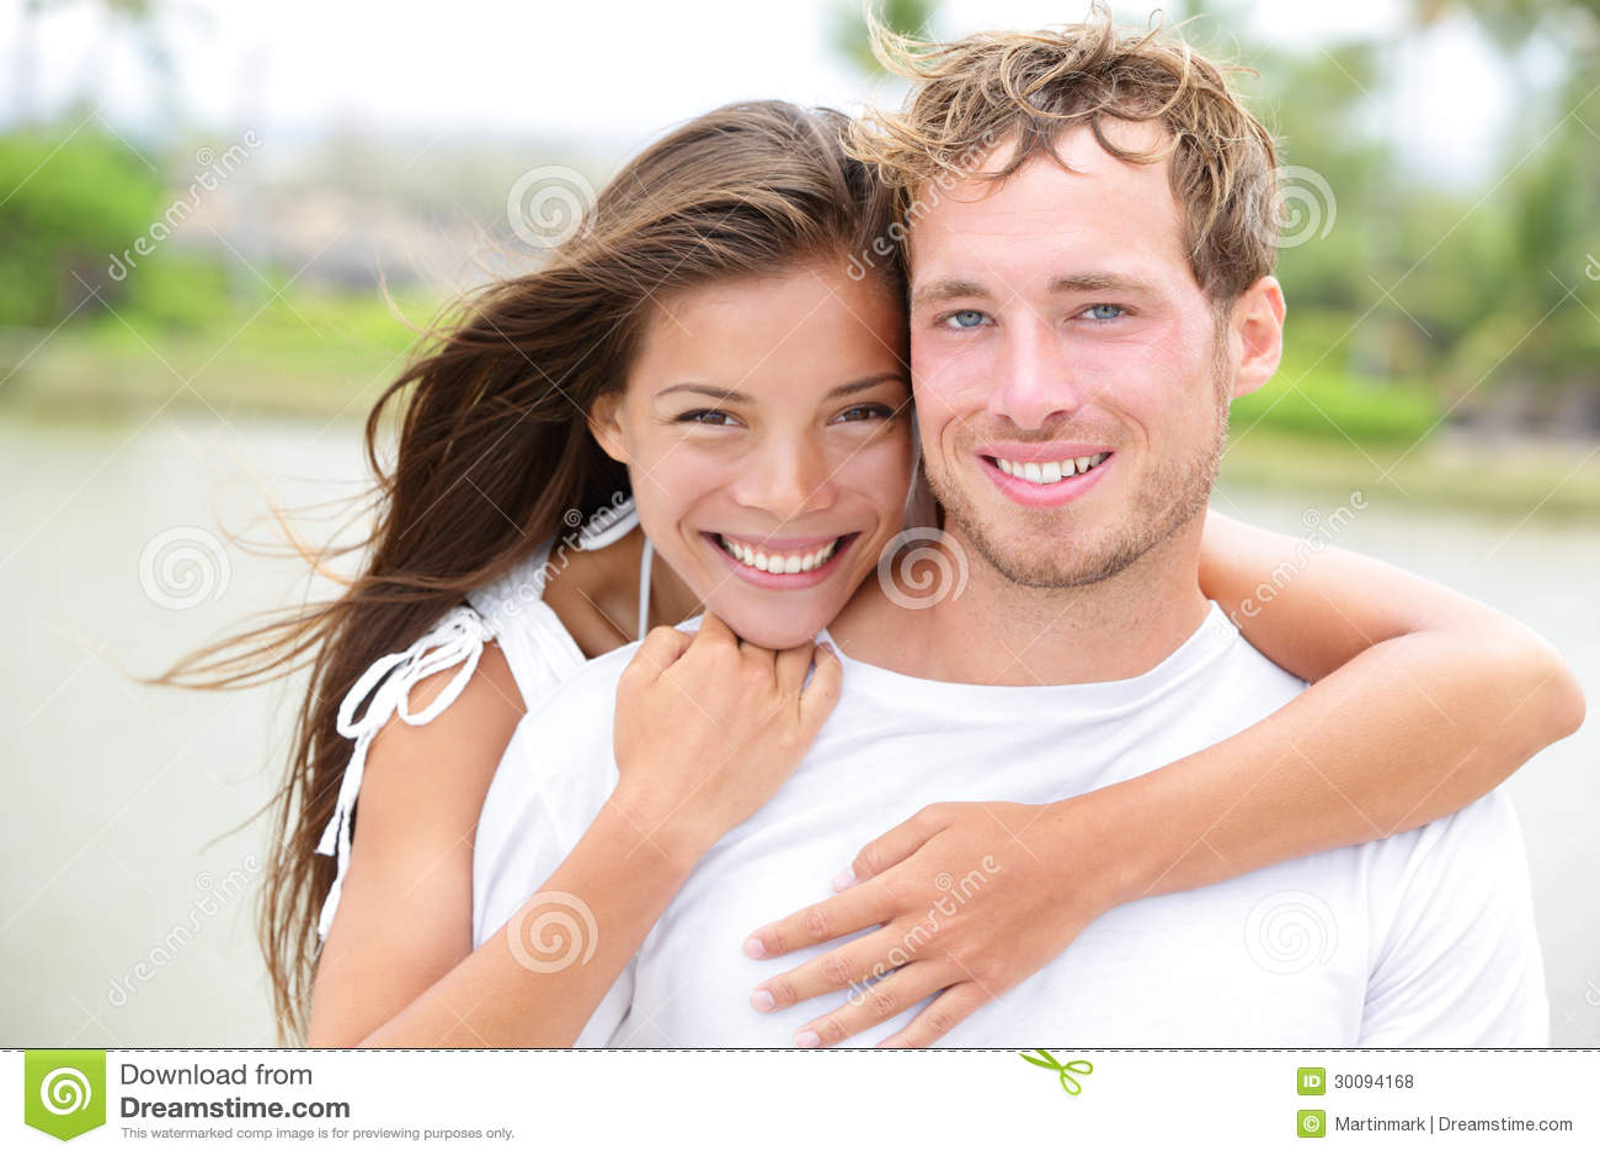 Couple Only Asian Manhattan 4 Couple White